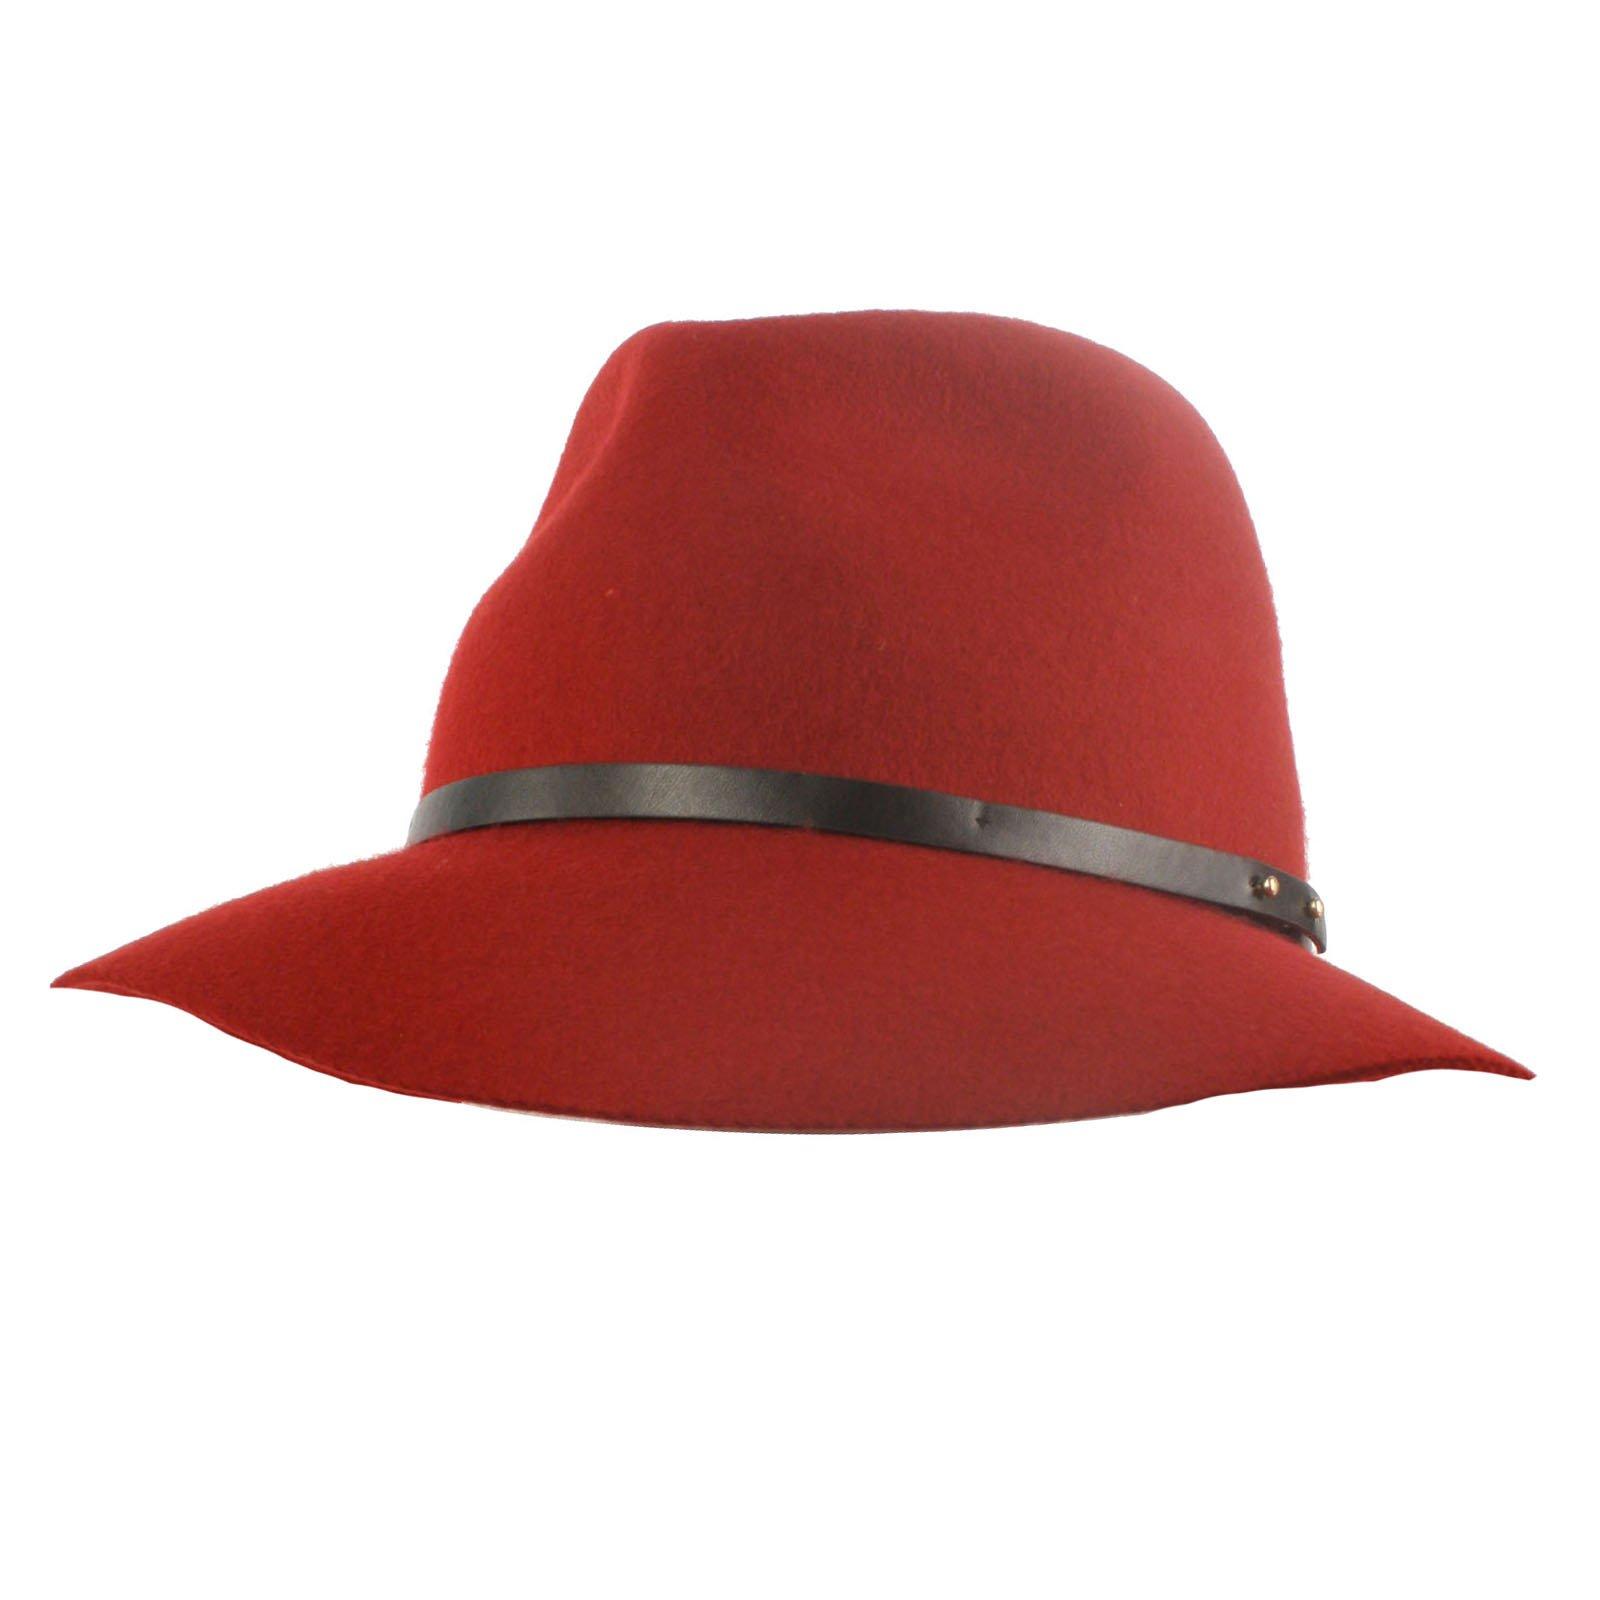 633a213375b SK Hat shop Winter Soft 100% Wool Felt Fedora Floppy Panama 3-1 8 Wide Brim  Dress Hat Wine Apparel